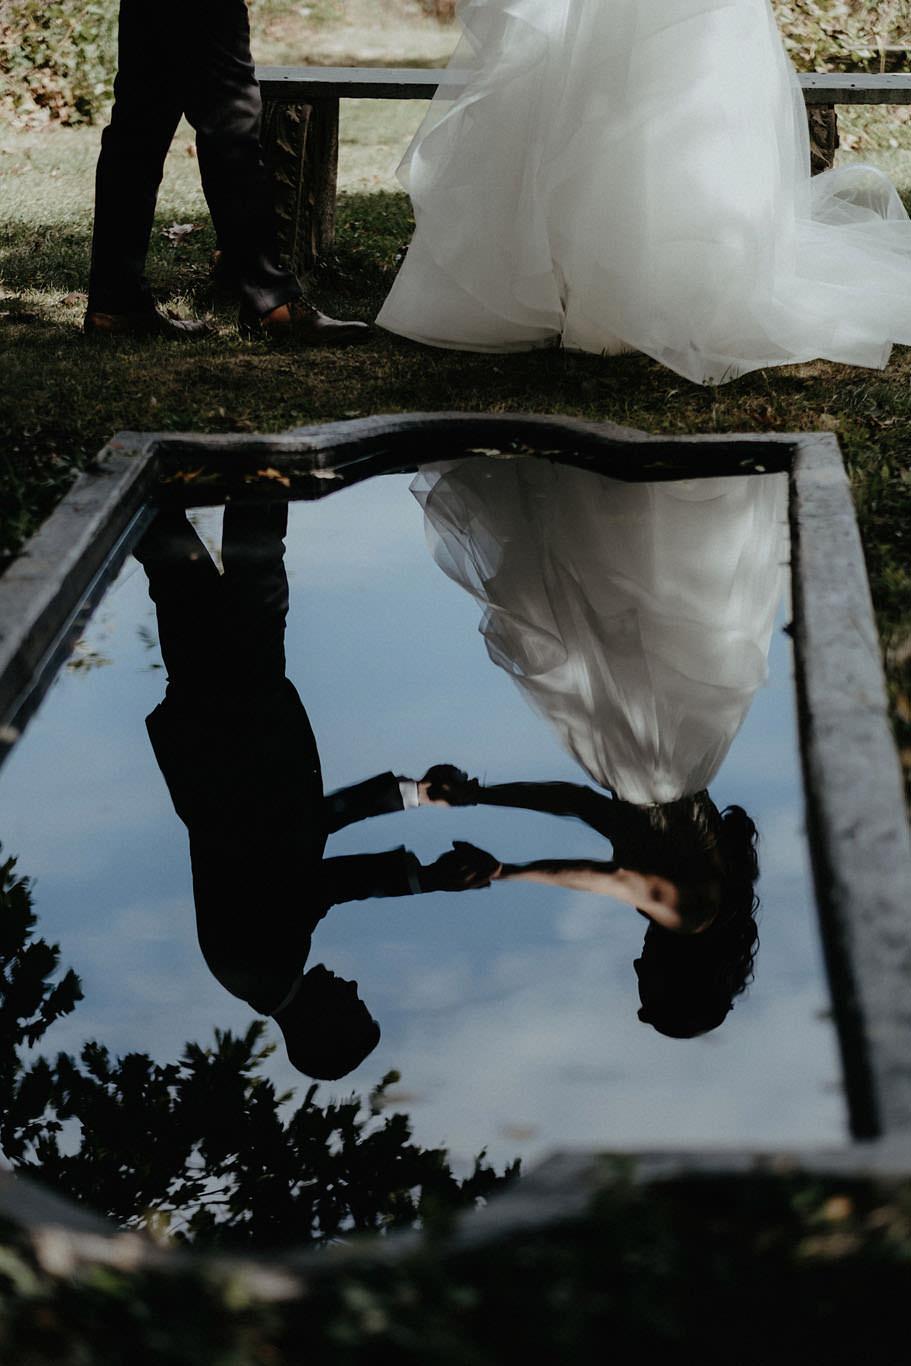 andover new jersey crossed keys estate adventure wedding photographer bride groom first look reflection